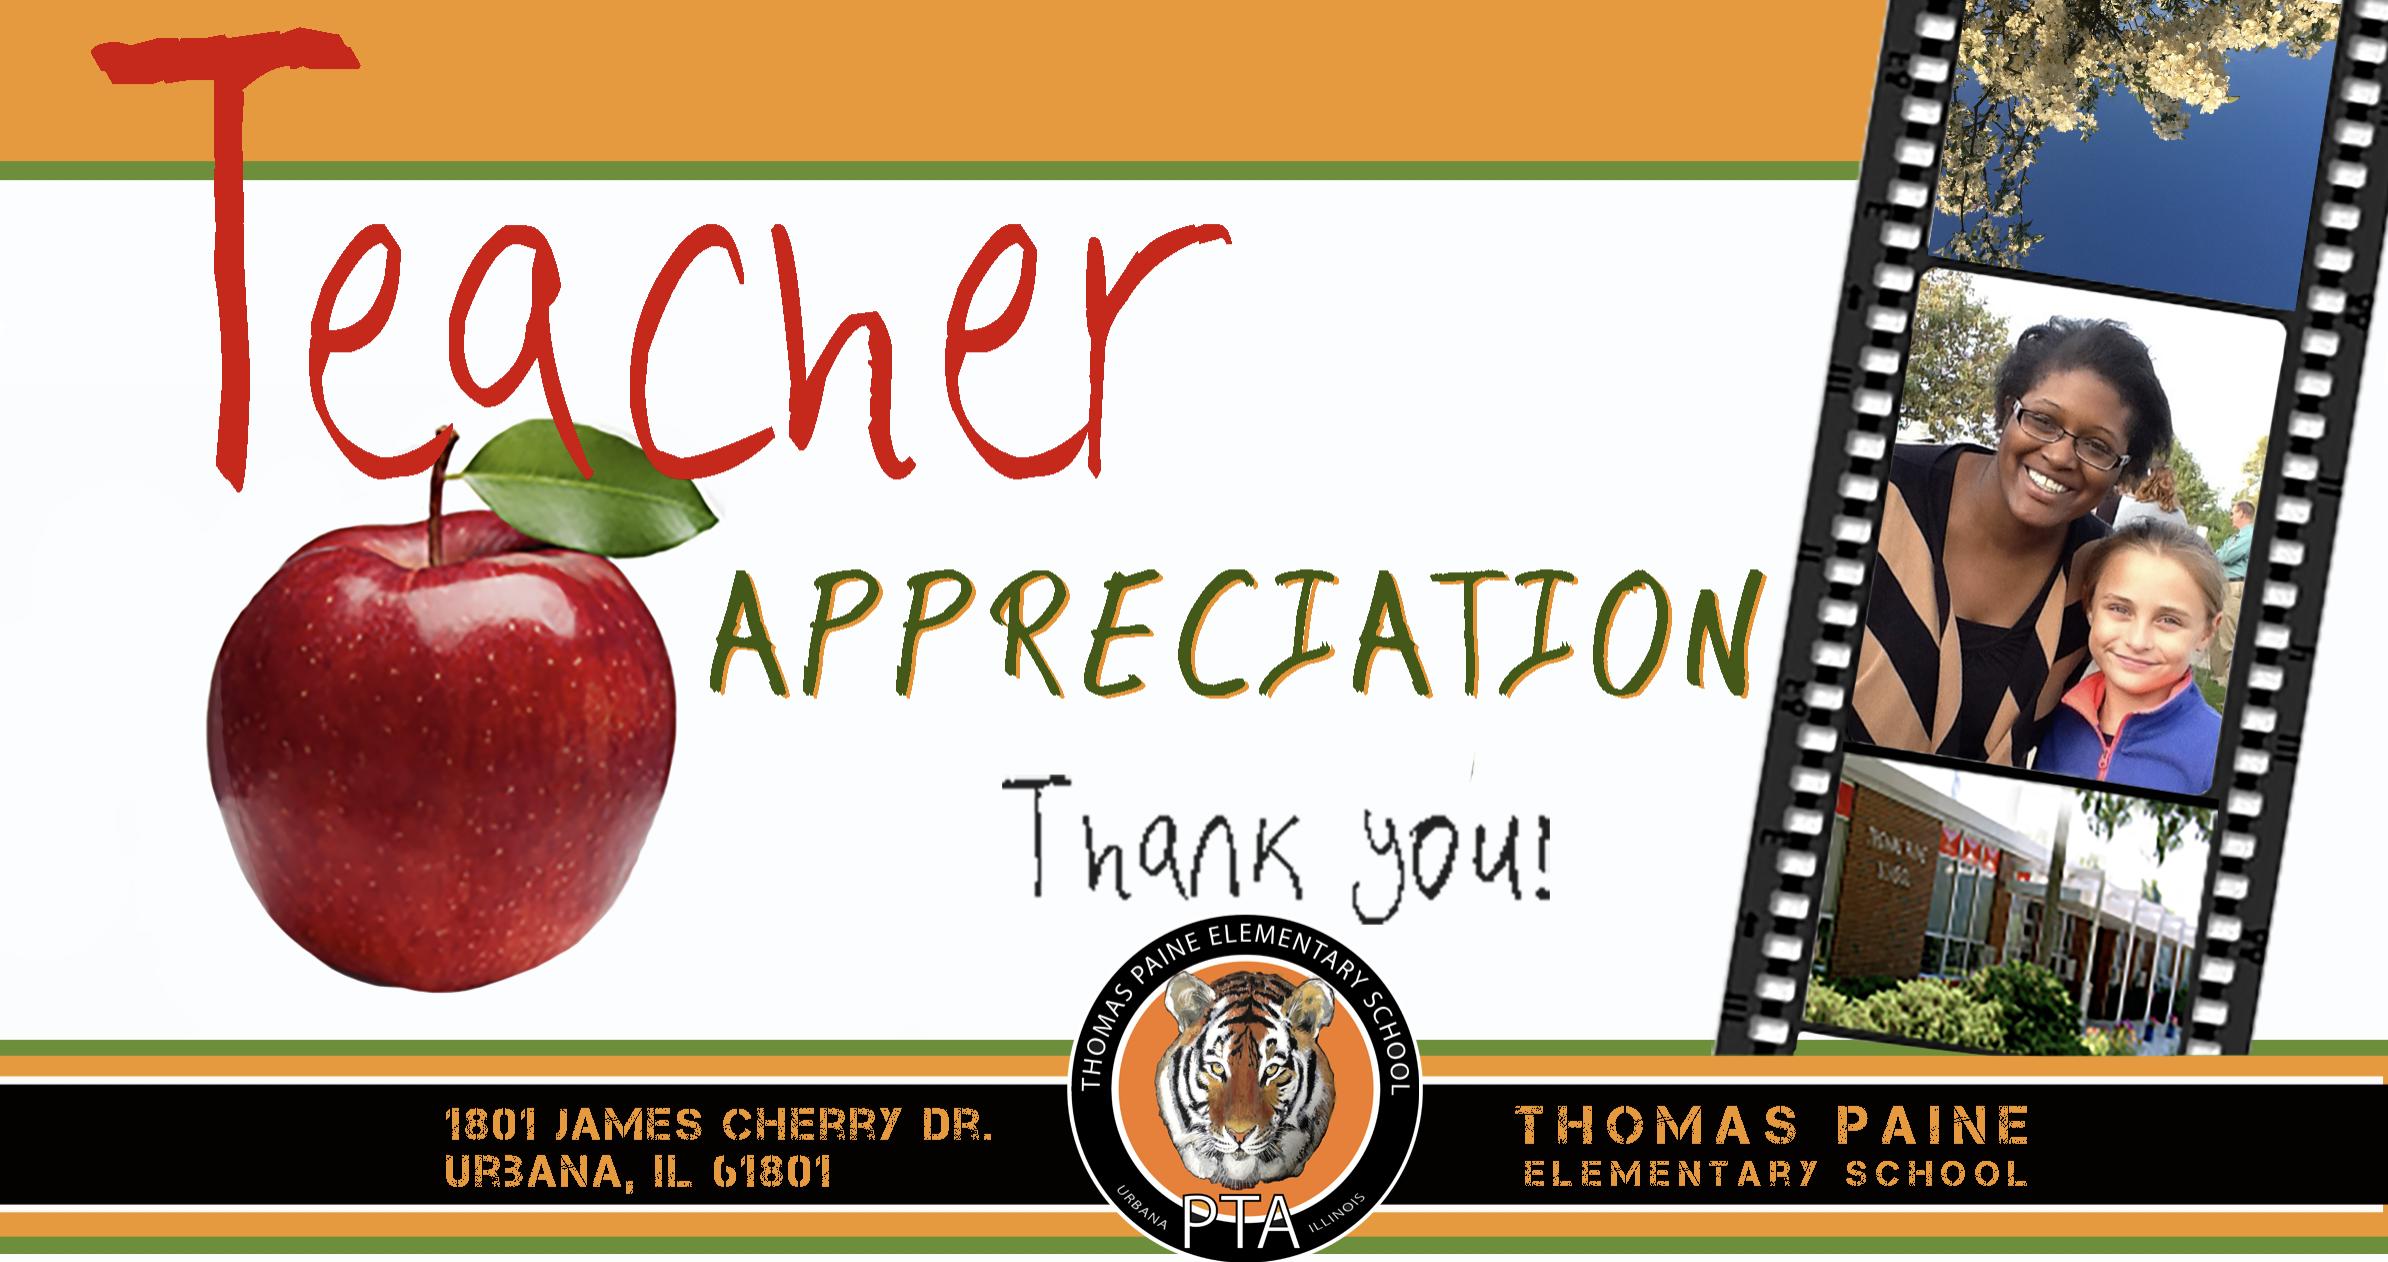 Thomas Paine Elementary School Urbana IL teacher appreciation week by Ganna Sheyko Anna Art Design